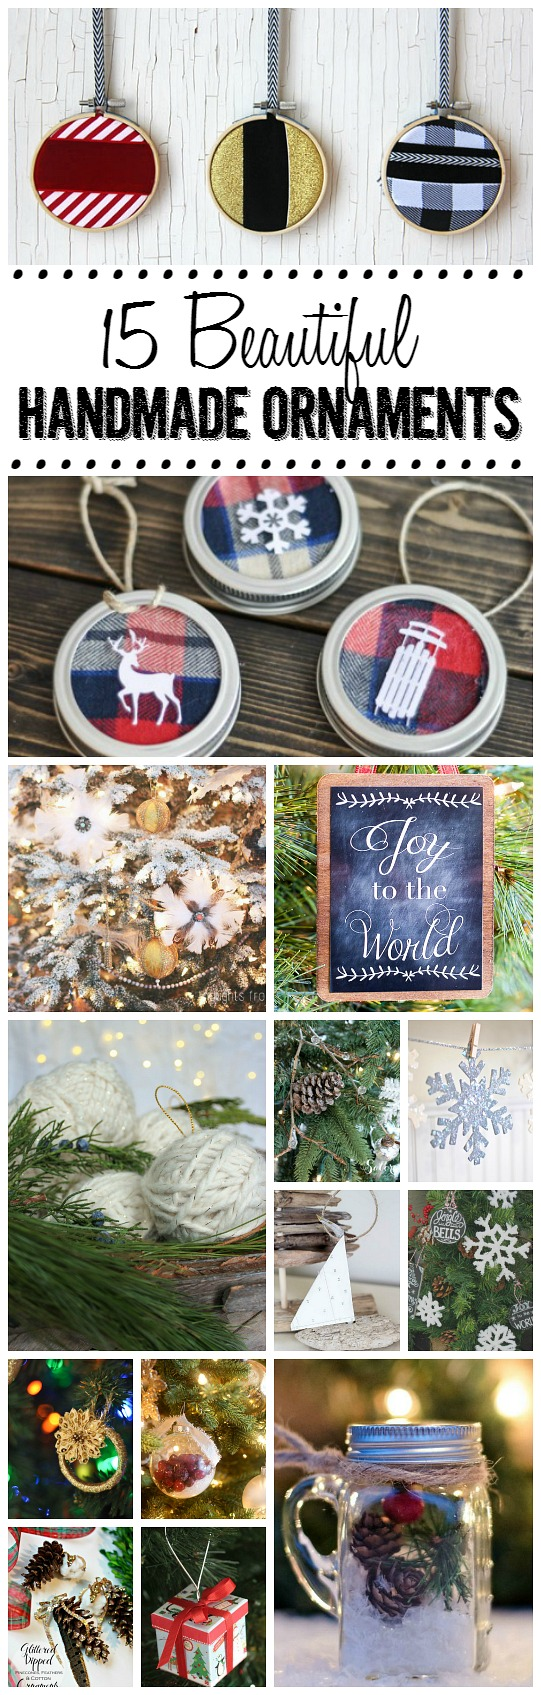 15-Beautiful-Handmade-Christmas-Ornaments